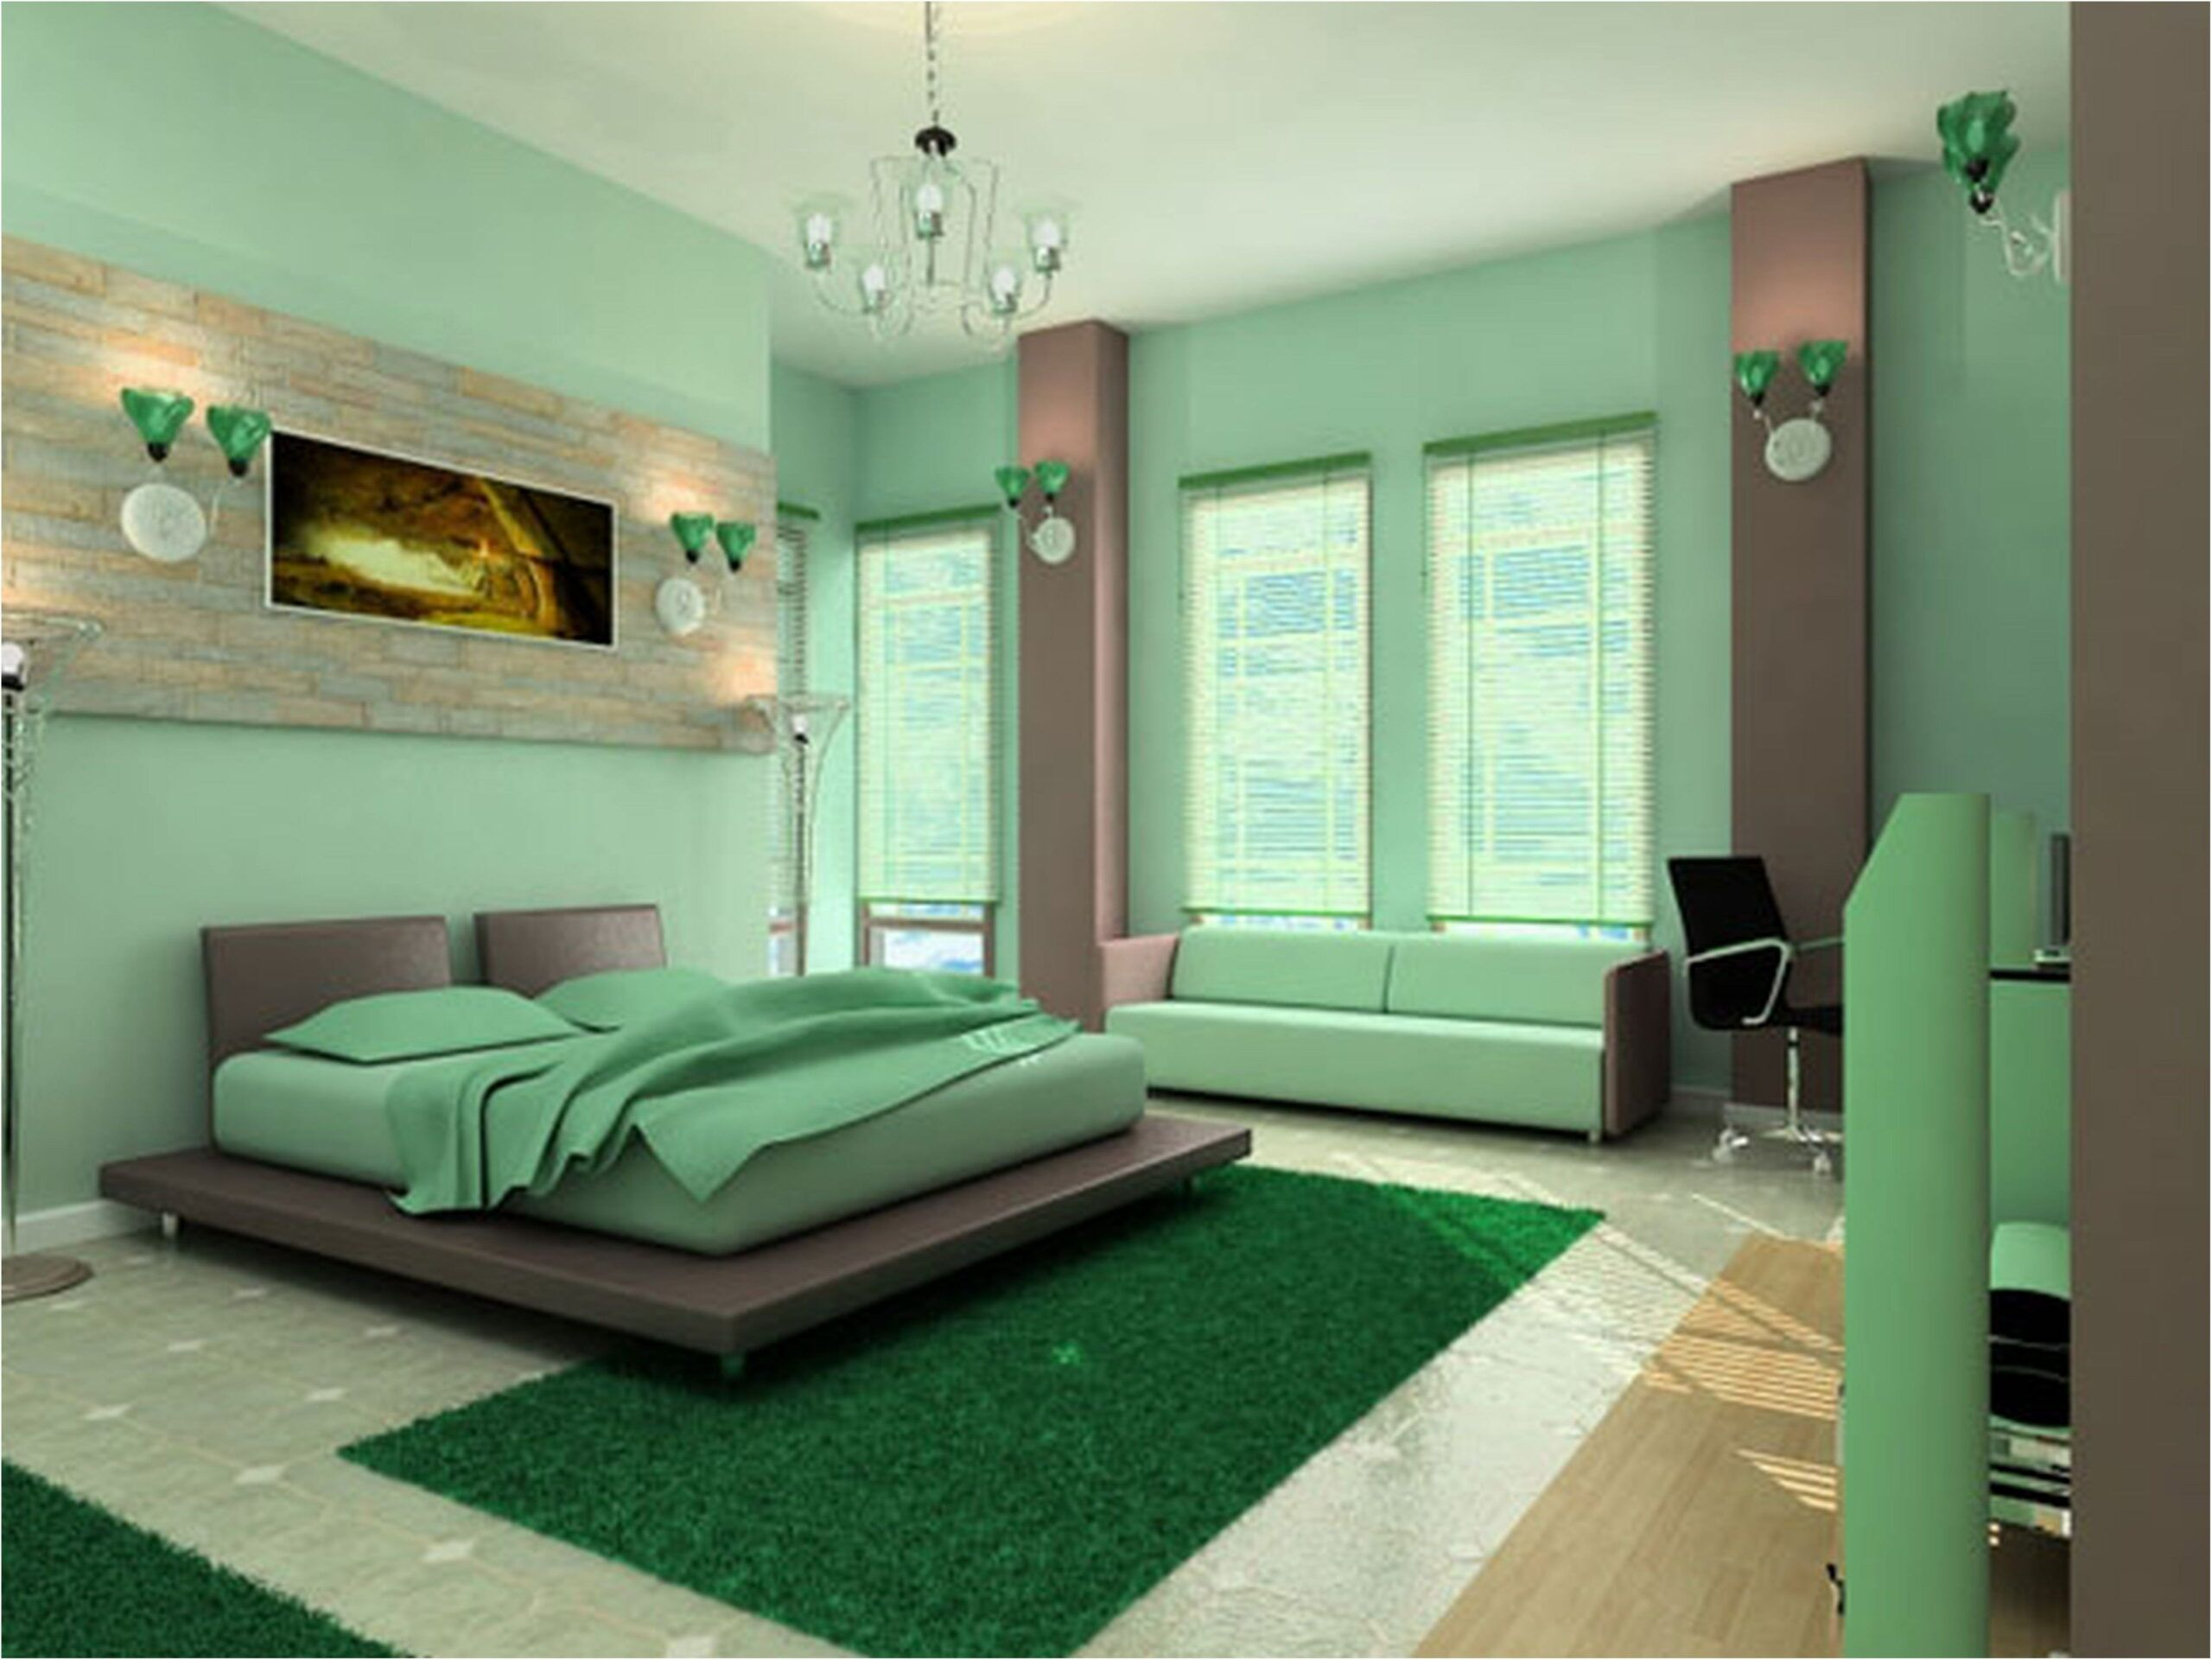 Unique Living Room Paint Ideas in 2020 | Green bedroom ...